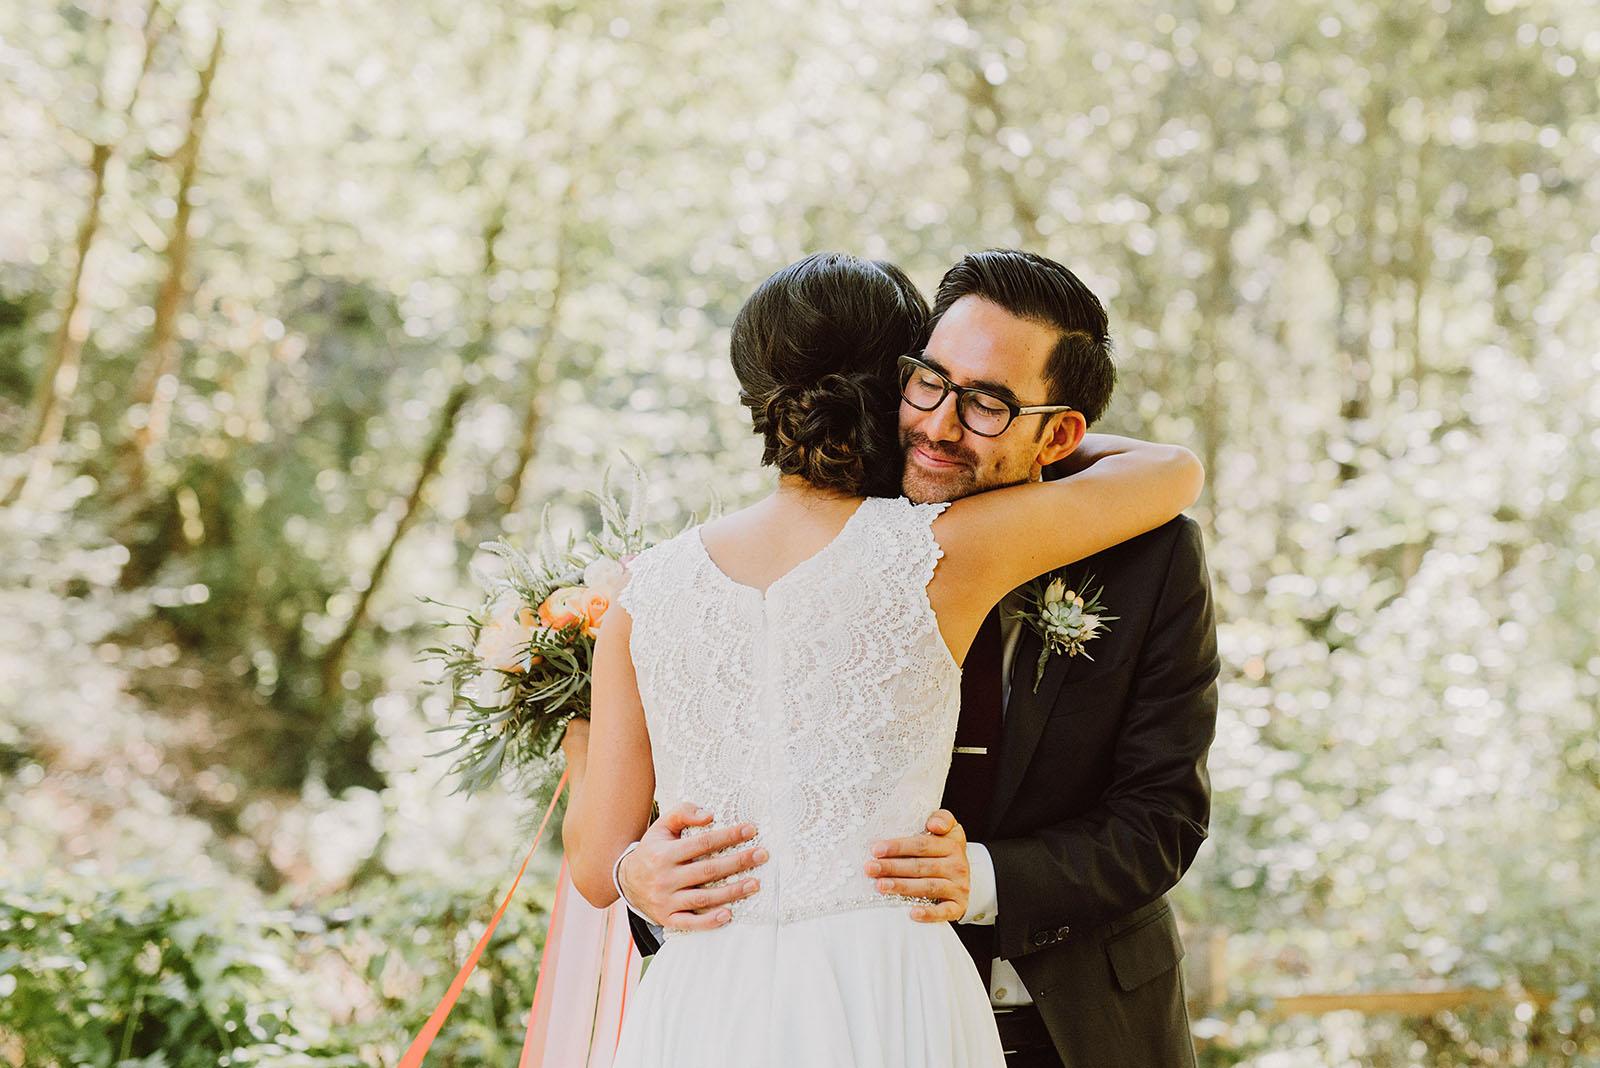 Bride and Groom's First Look in MacLeay Park | Portland Castaway Wedding